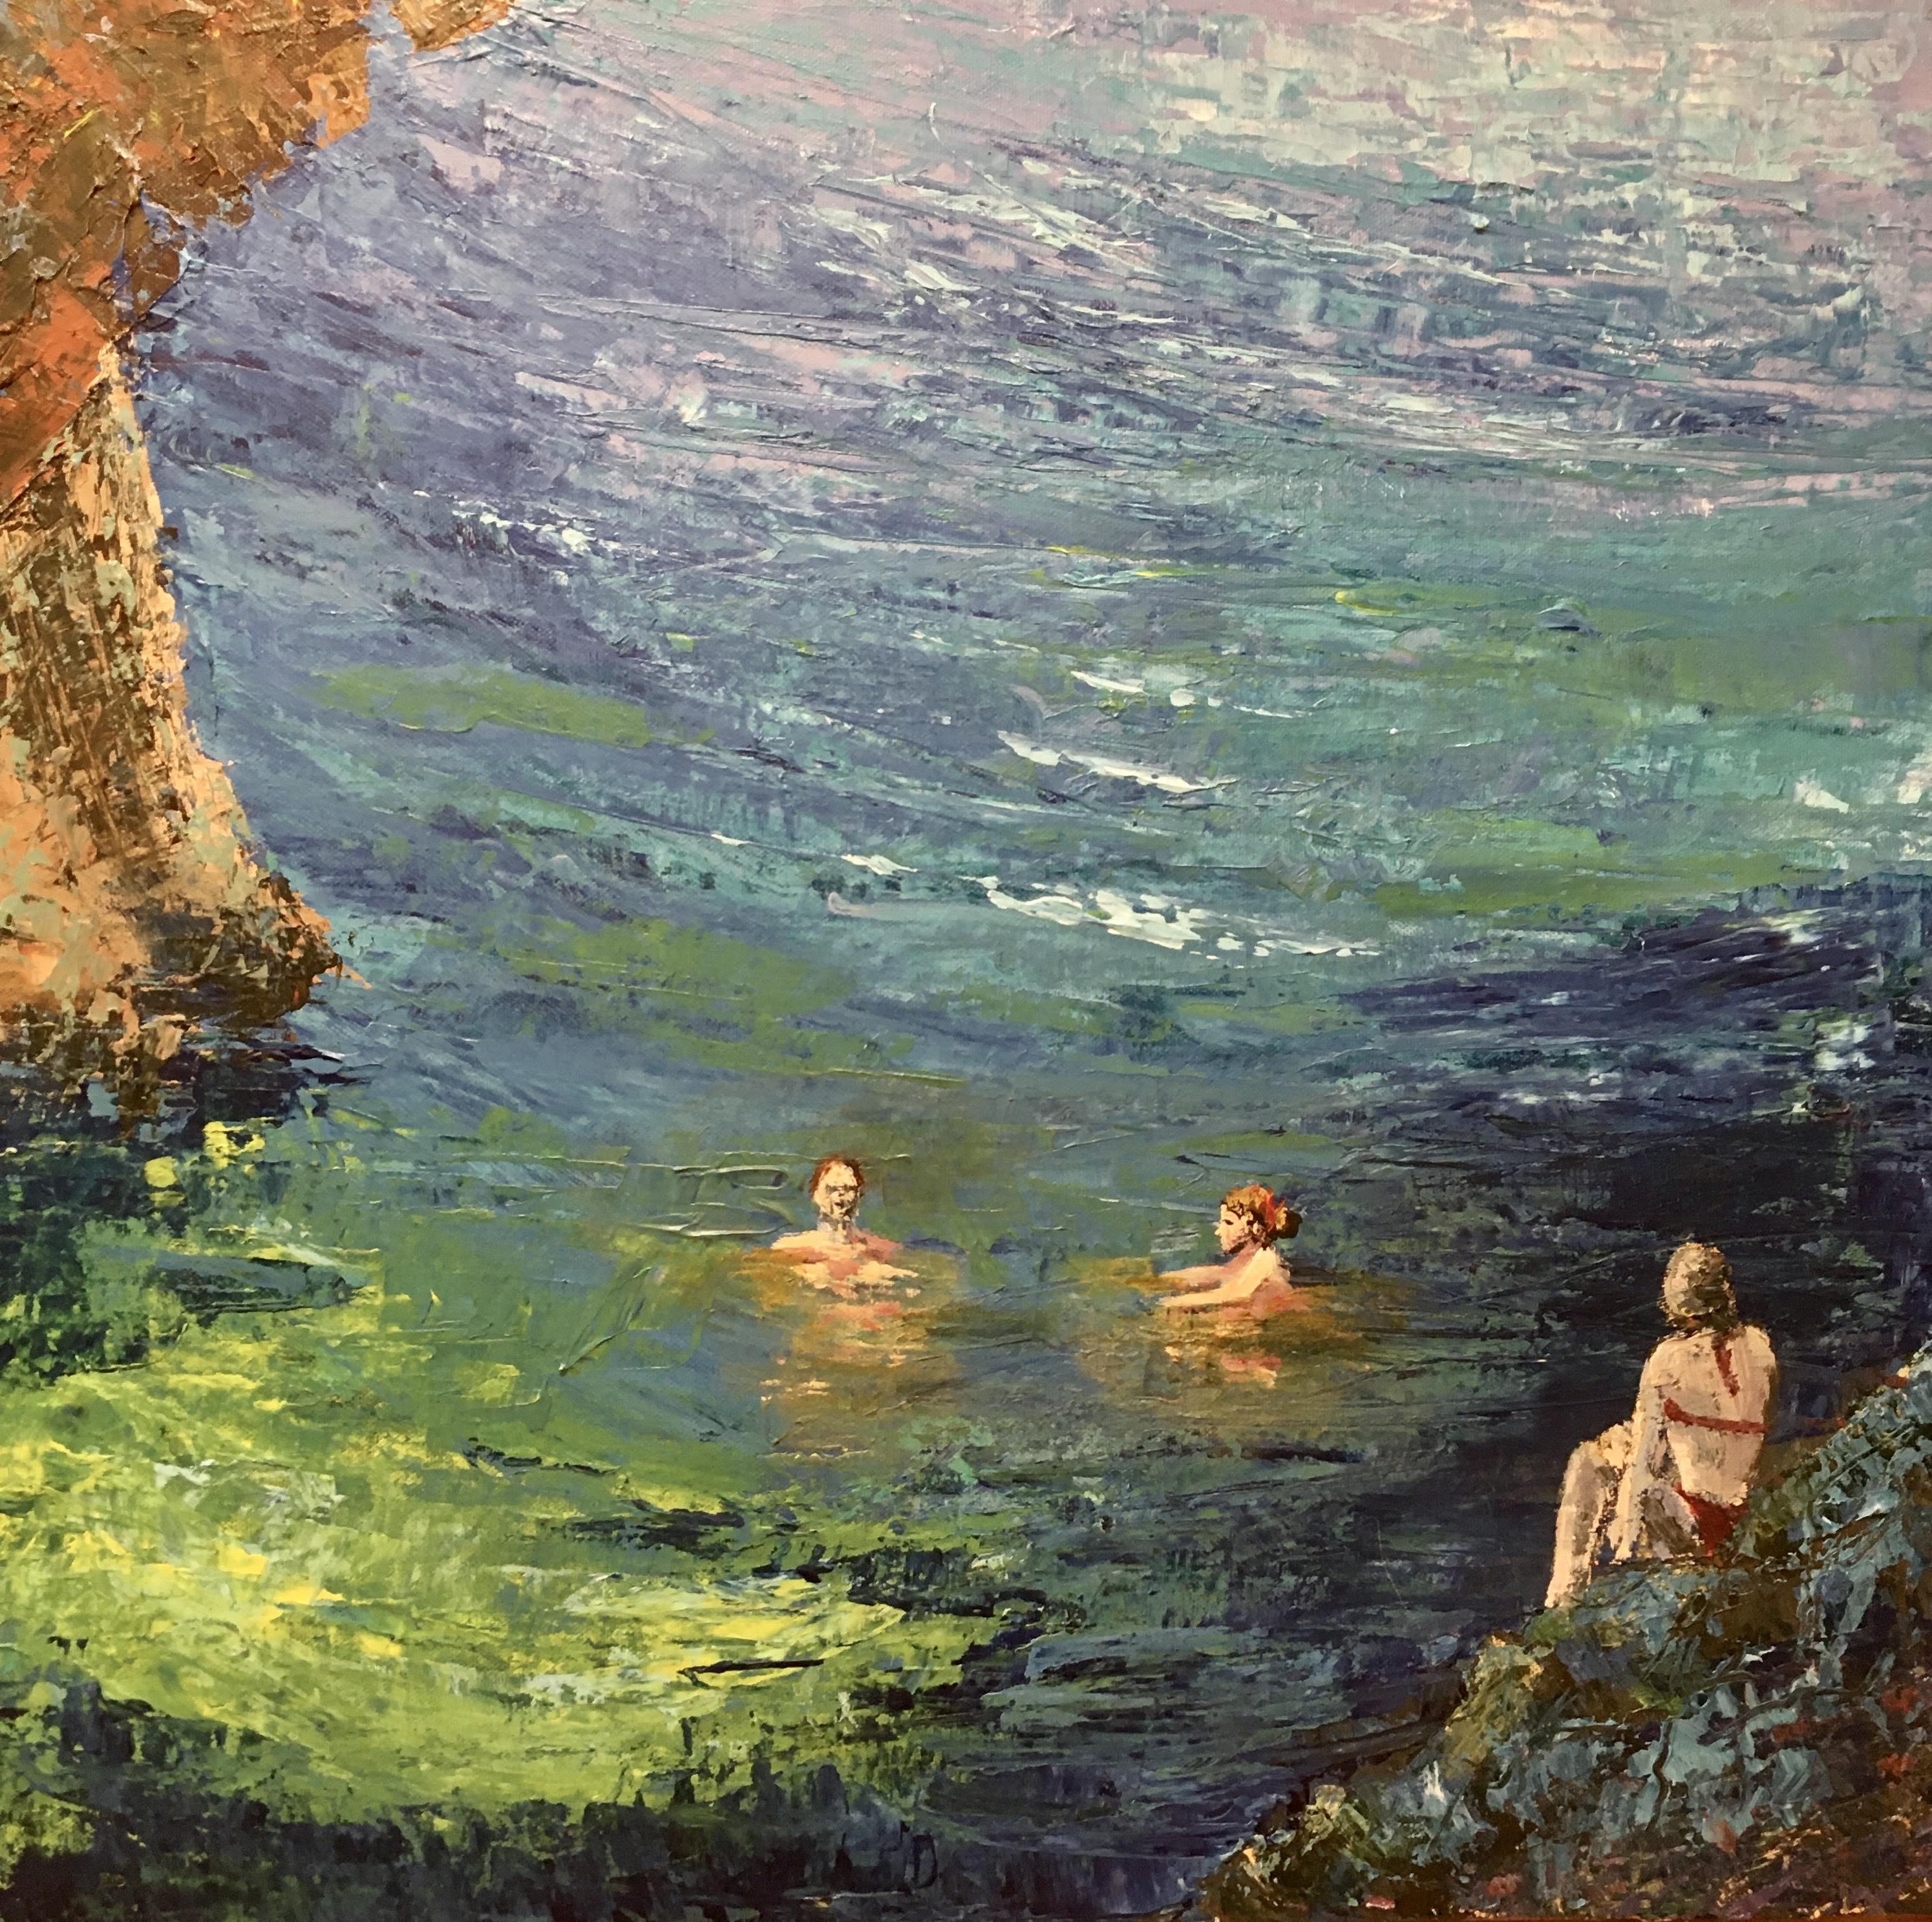 Faye Knight - Wild Swimmingamed